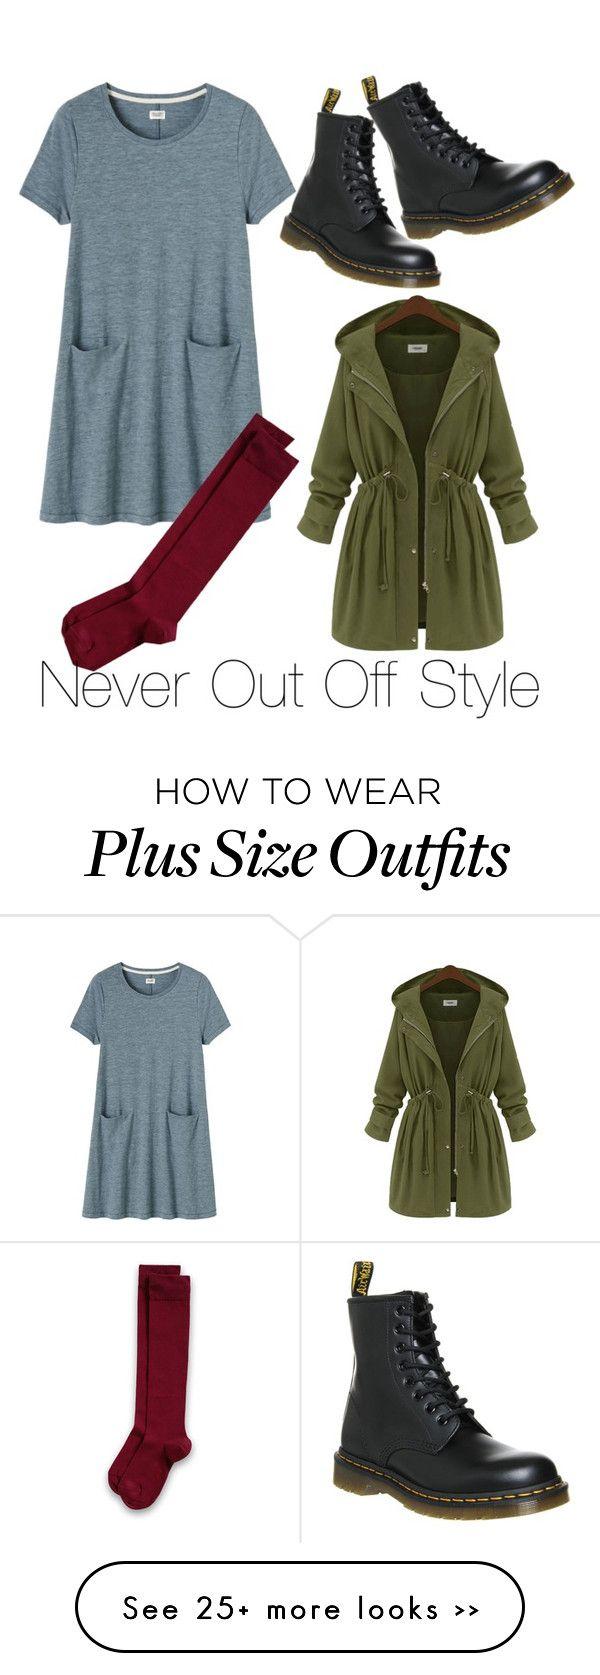 5 ways to wear a plus size parka - 5-ways-to-wear-a-plus-size-parka